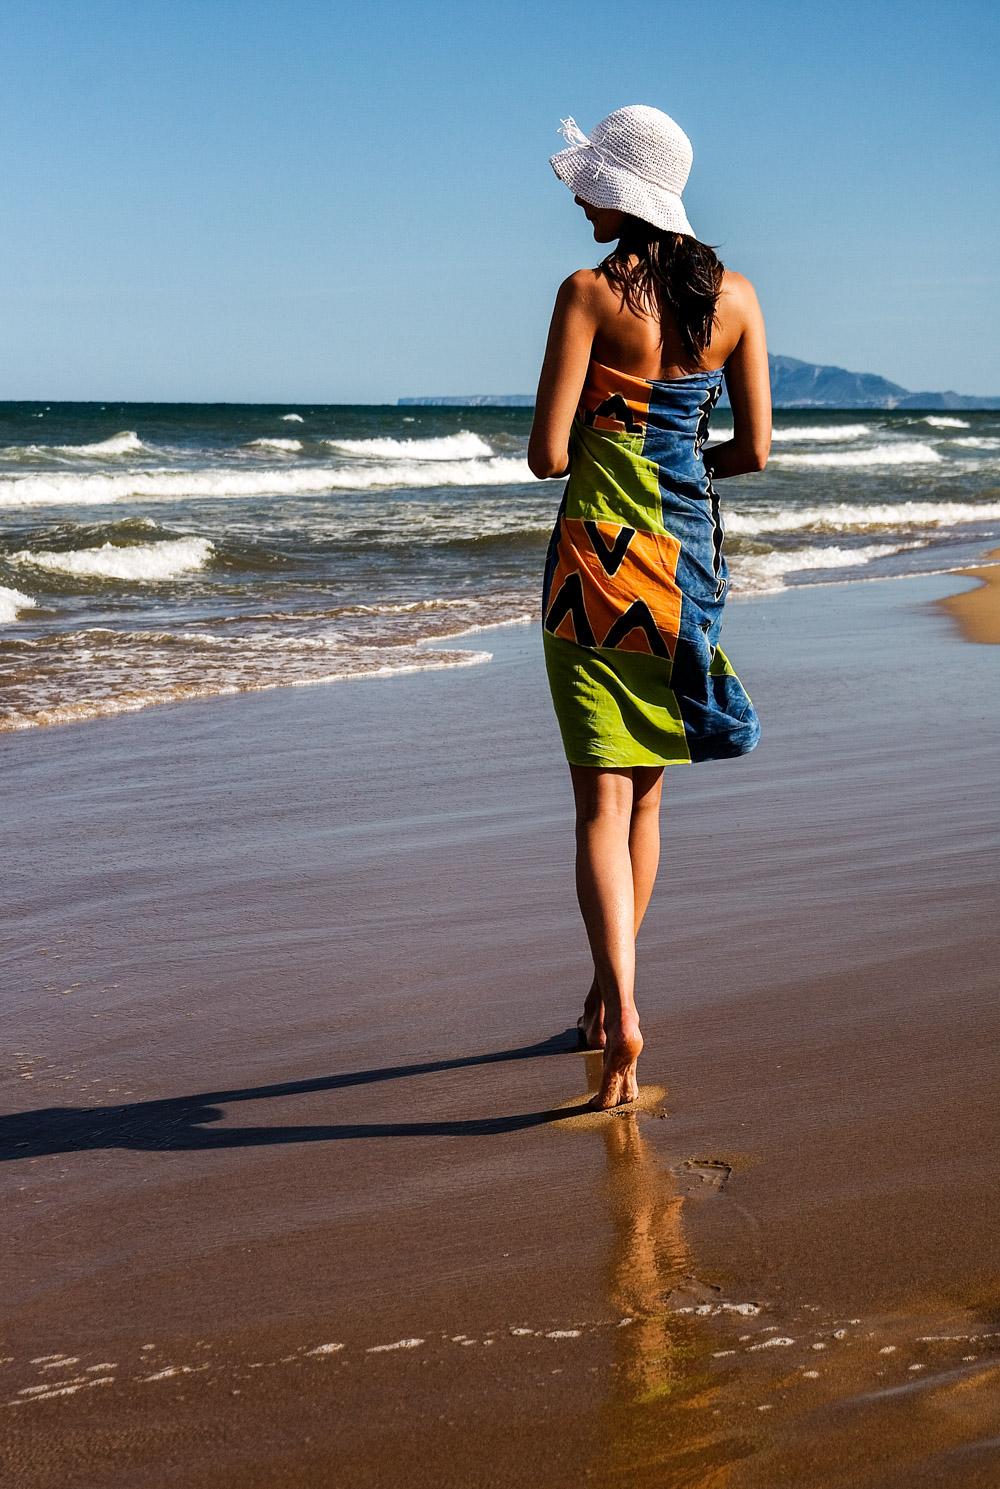 009 A woman walking on the Gandia beach.jpg